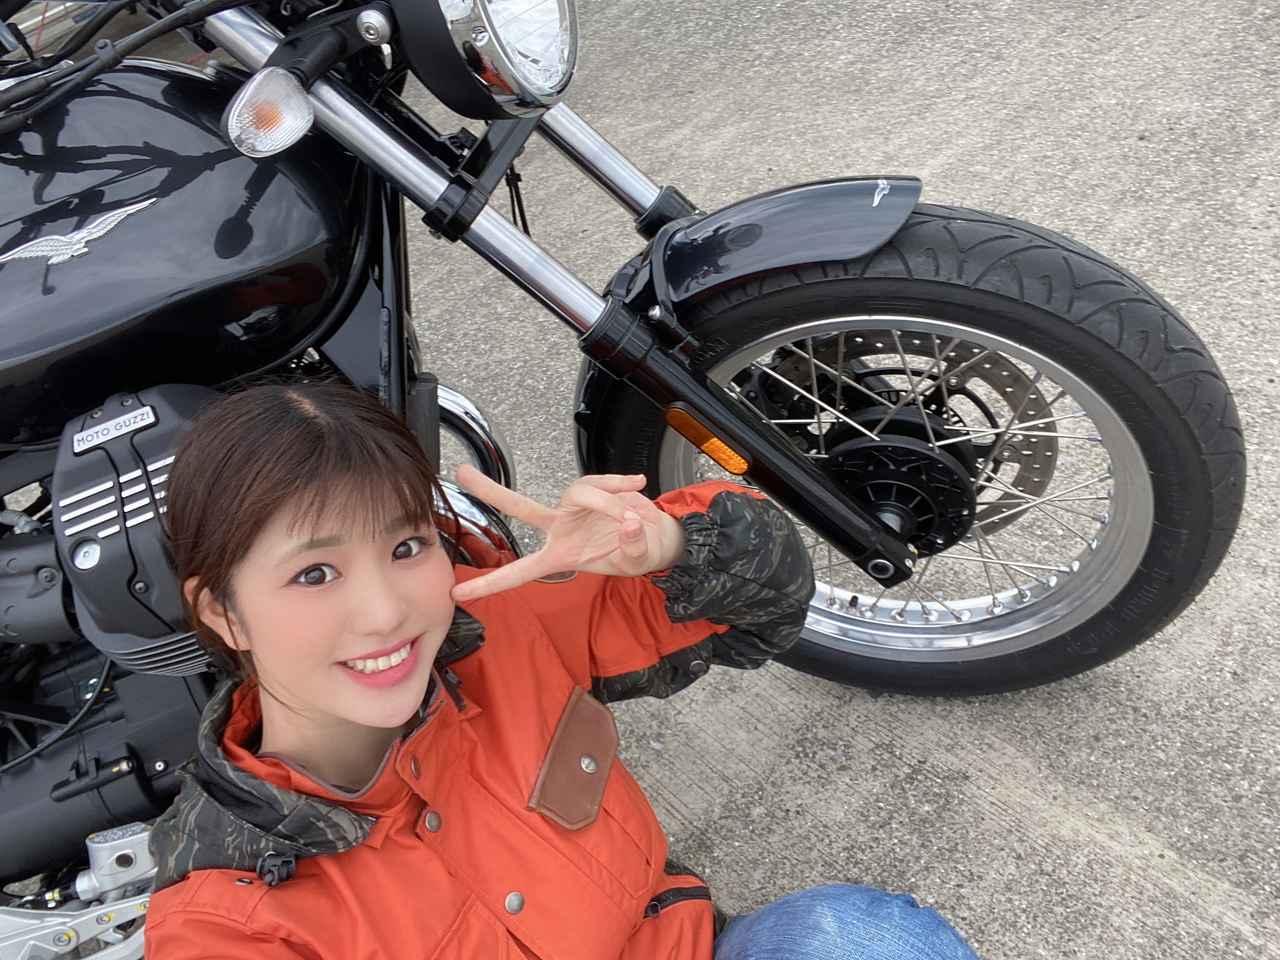 Images : 10番目の画像 - 「【女子部キャンツー 2/6】MOTOGUZZI V7III SPECIAL × 梅本まどか 編」のアルバム - webオートバイ